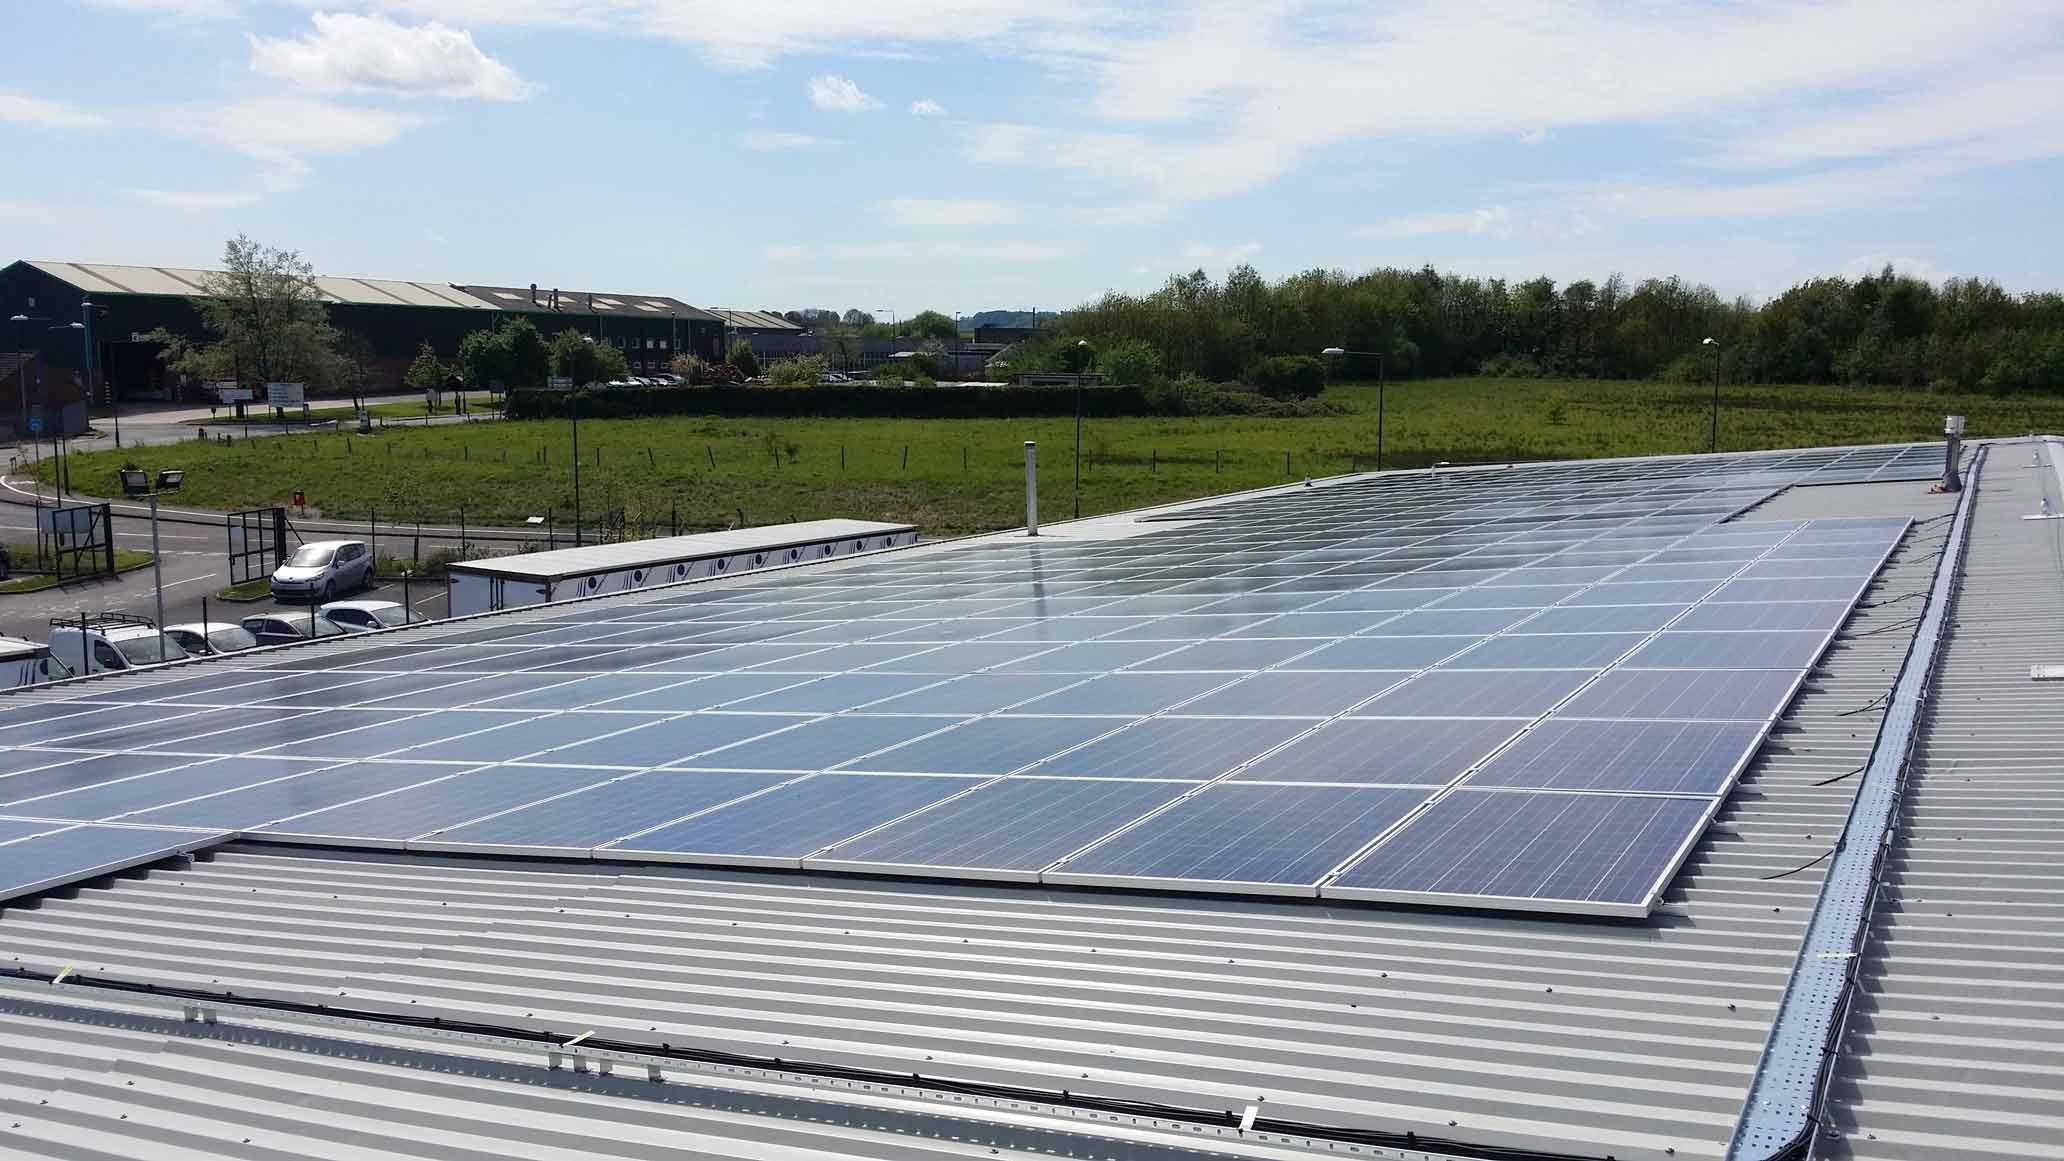 Commercial Solar Power Quality Electrical Sydney Panel Wiring Center Texttextstyledynamictextpositionstaticbottomtextautohidetruetextpositionmarginstatic0